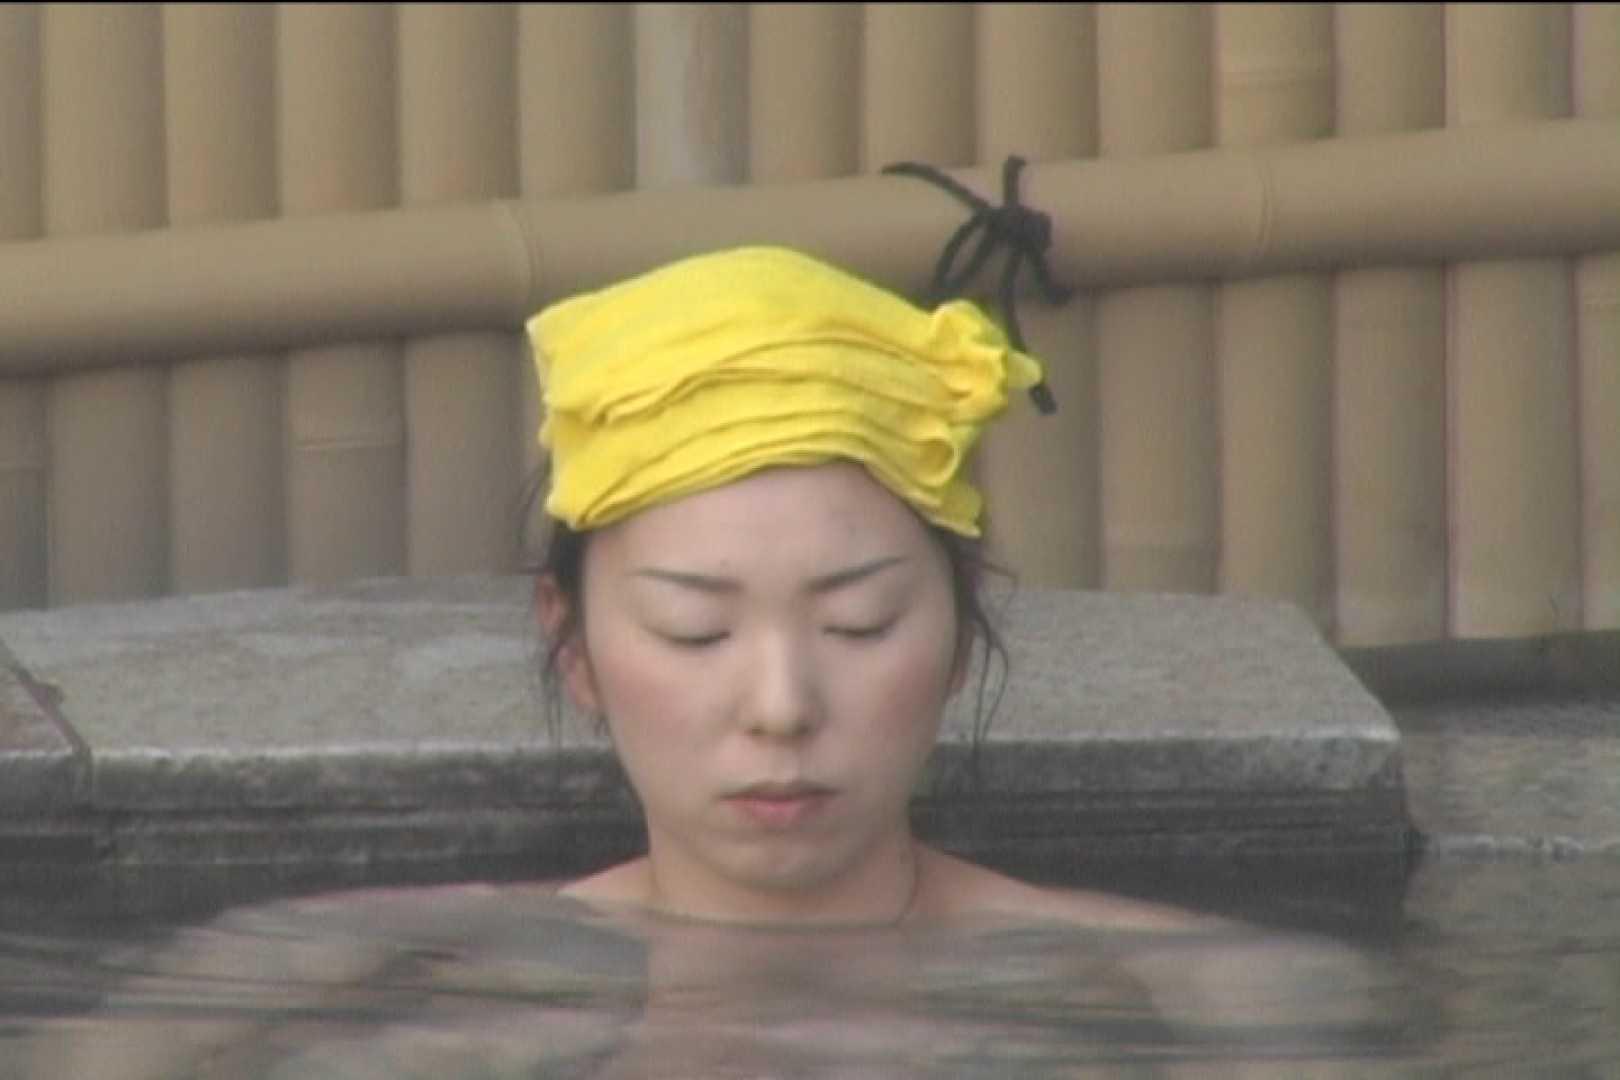 Aquaな露天風呂Vol.529 盗撮映像  51Pix 27